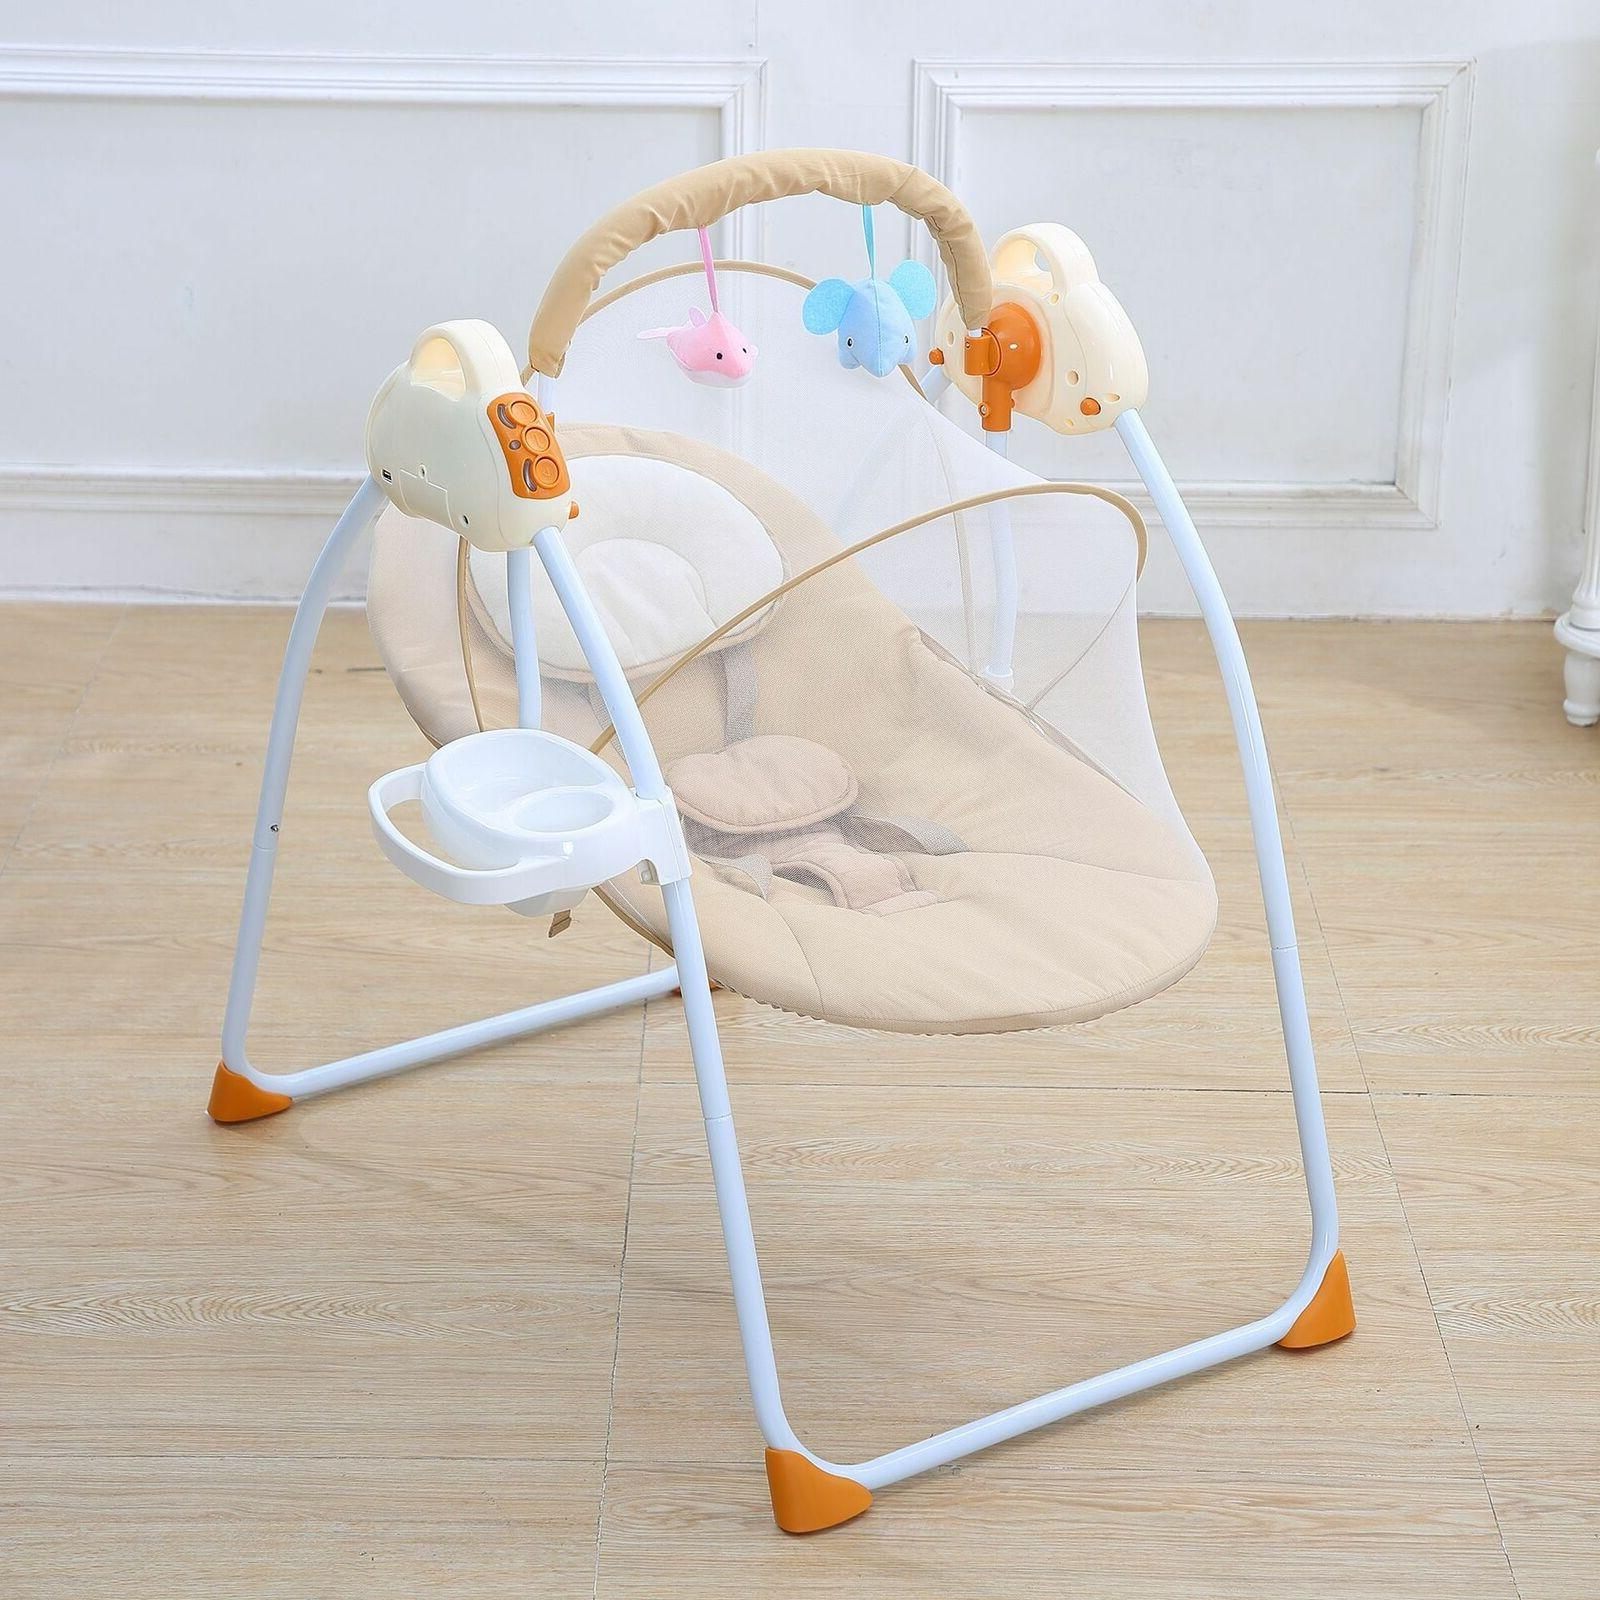 Electric Baby Cradle Sleeping Rocking Bassinet Foldable